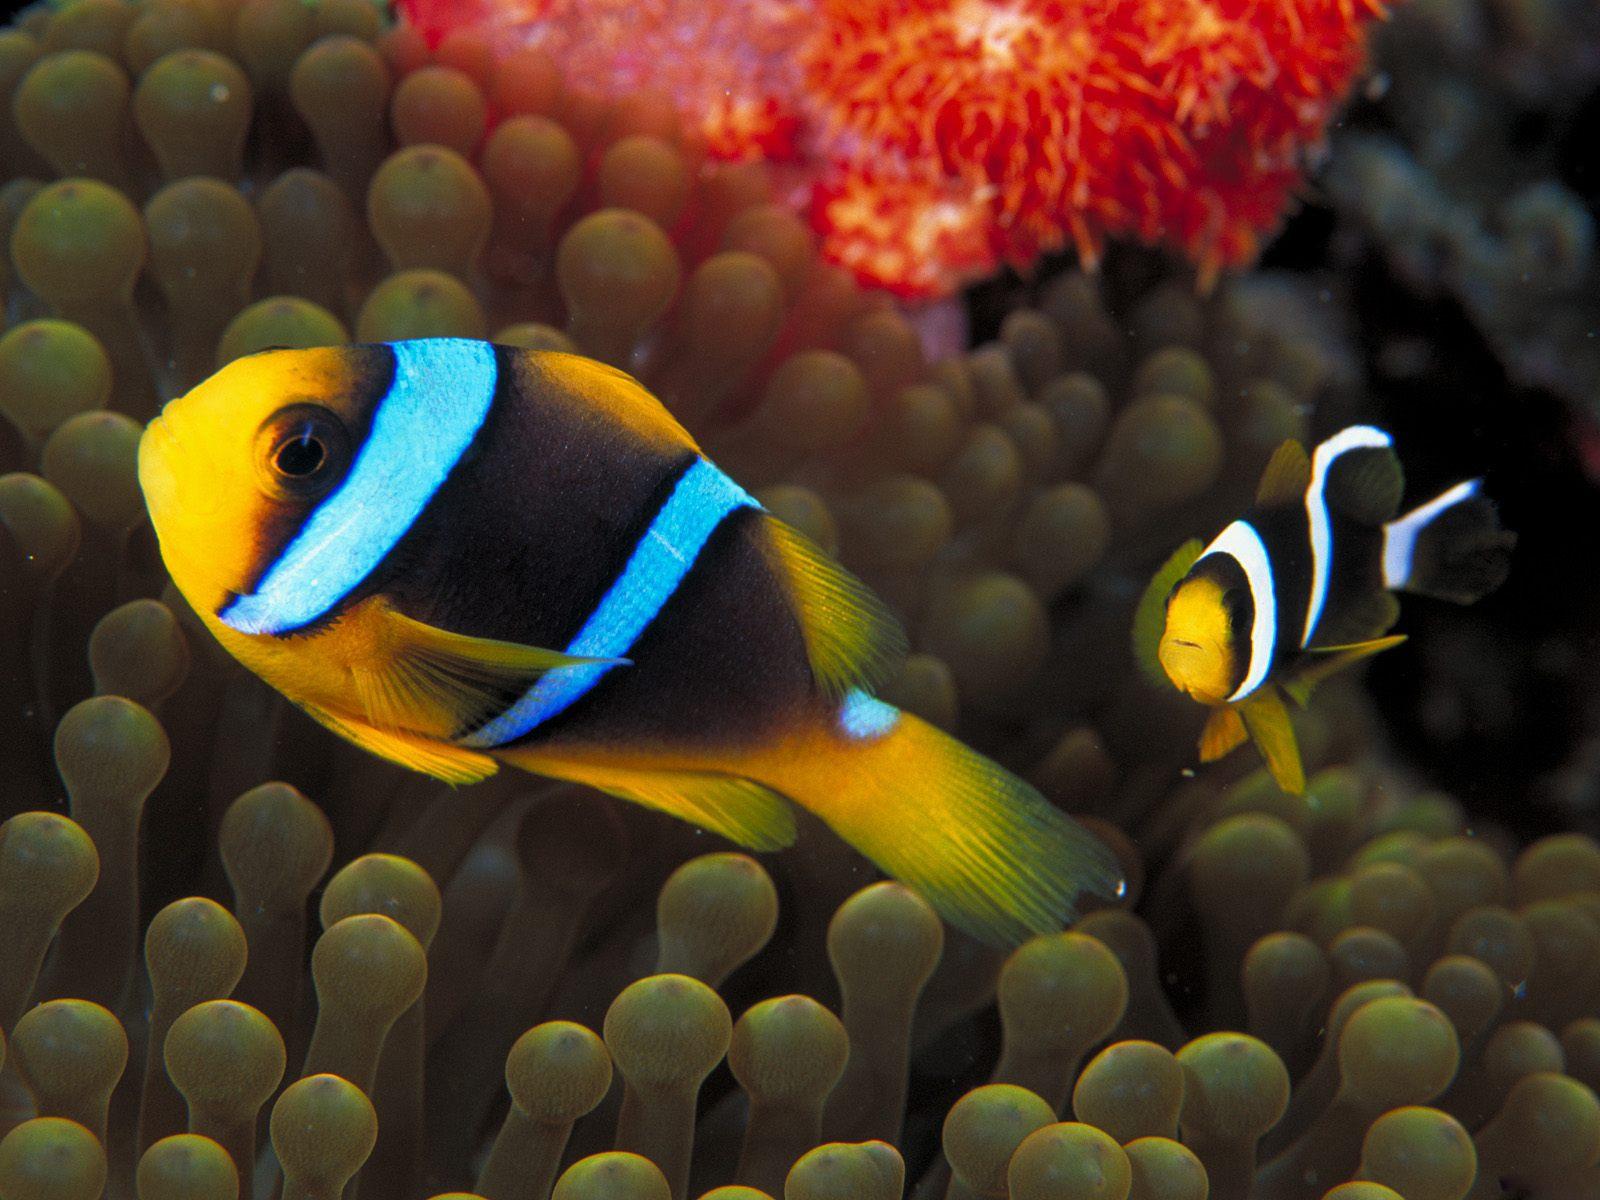 http://3.bp.blogspot.com/-hfiAlAOTCBQ/TkrRbQ4FF2I/AAAAAAAALkk/iTHlA_TdFJ0/s1600/Underwater+Wallpapers+%252821%2529.jpg